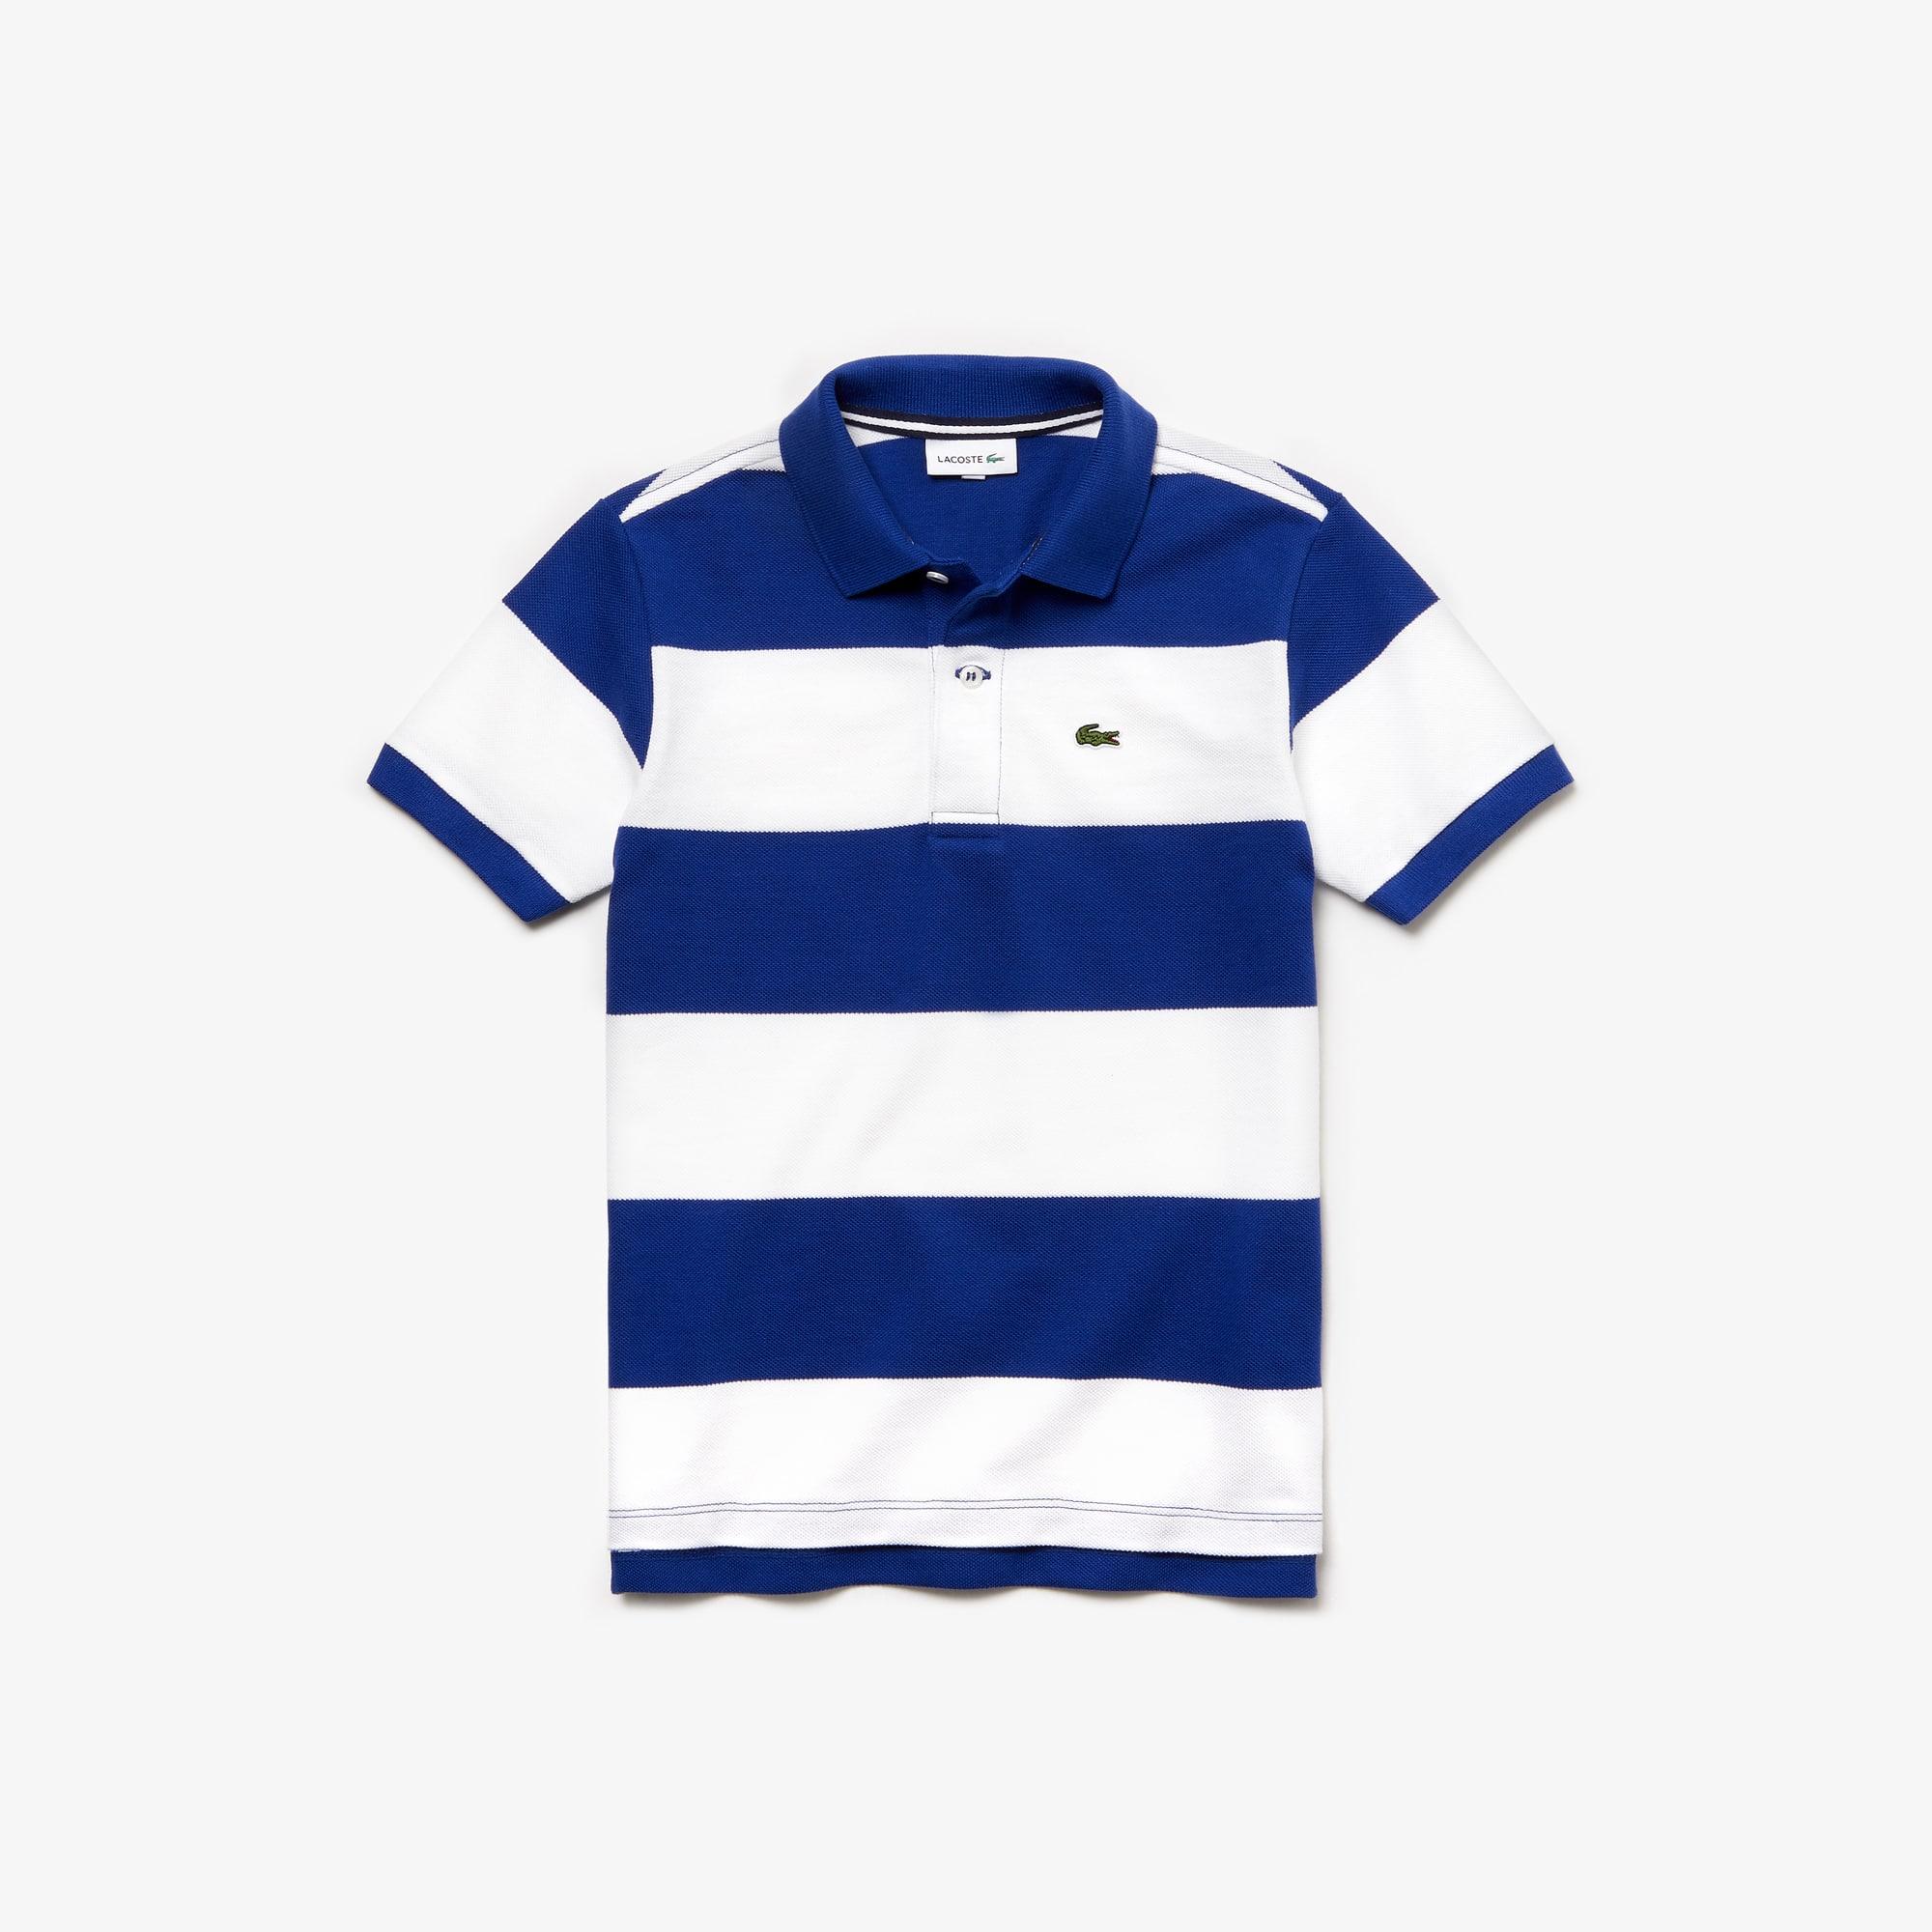 e67de729f2 Boys' Lacoste Striped Cotton Petit Piqué Polo Shirt   LACOSTE